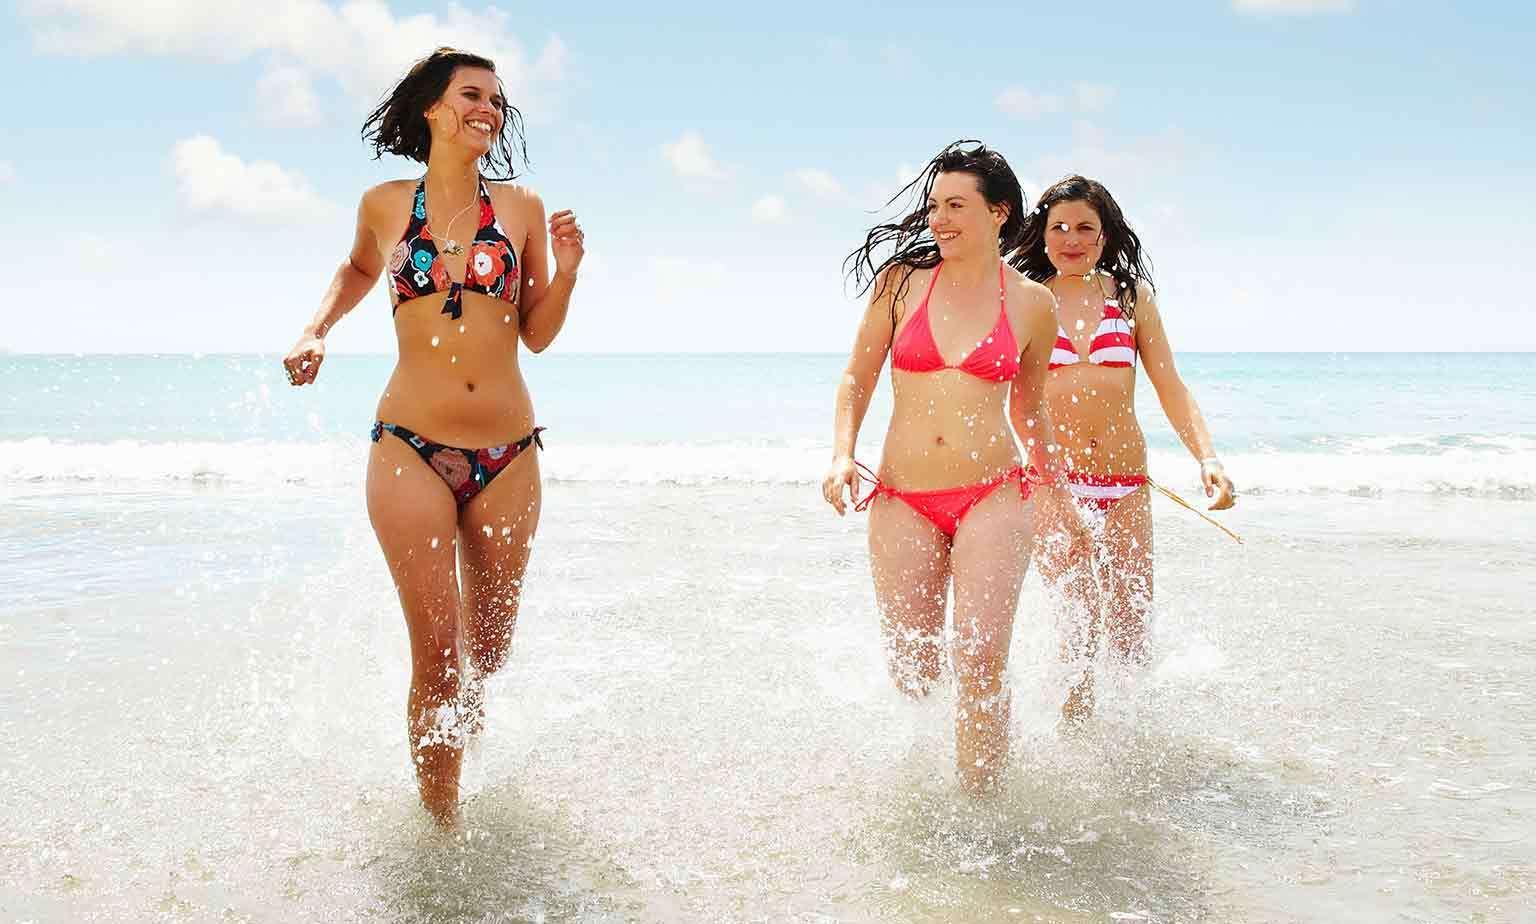 Women's Selected Clothing: Swimwear